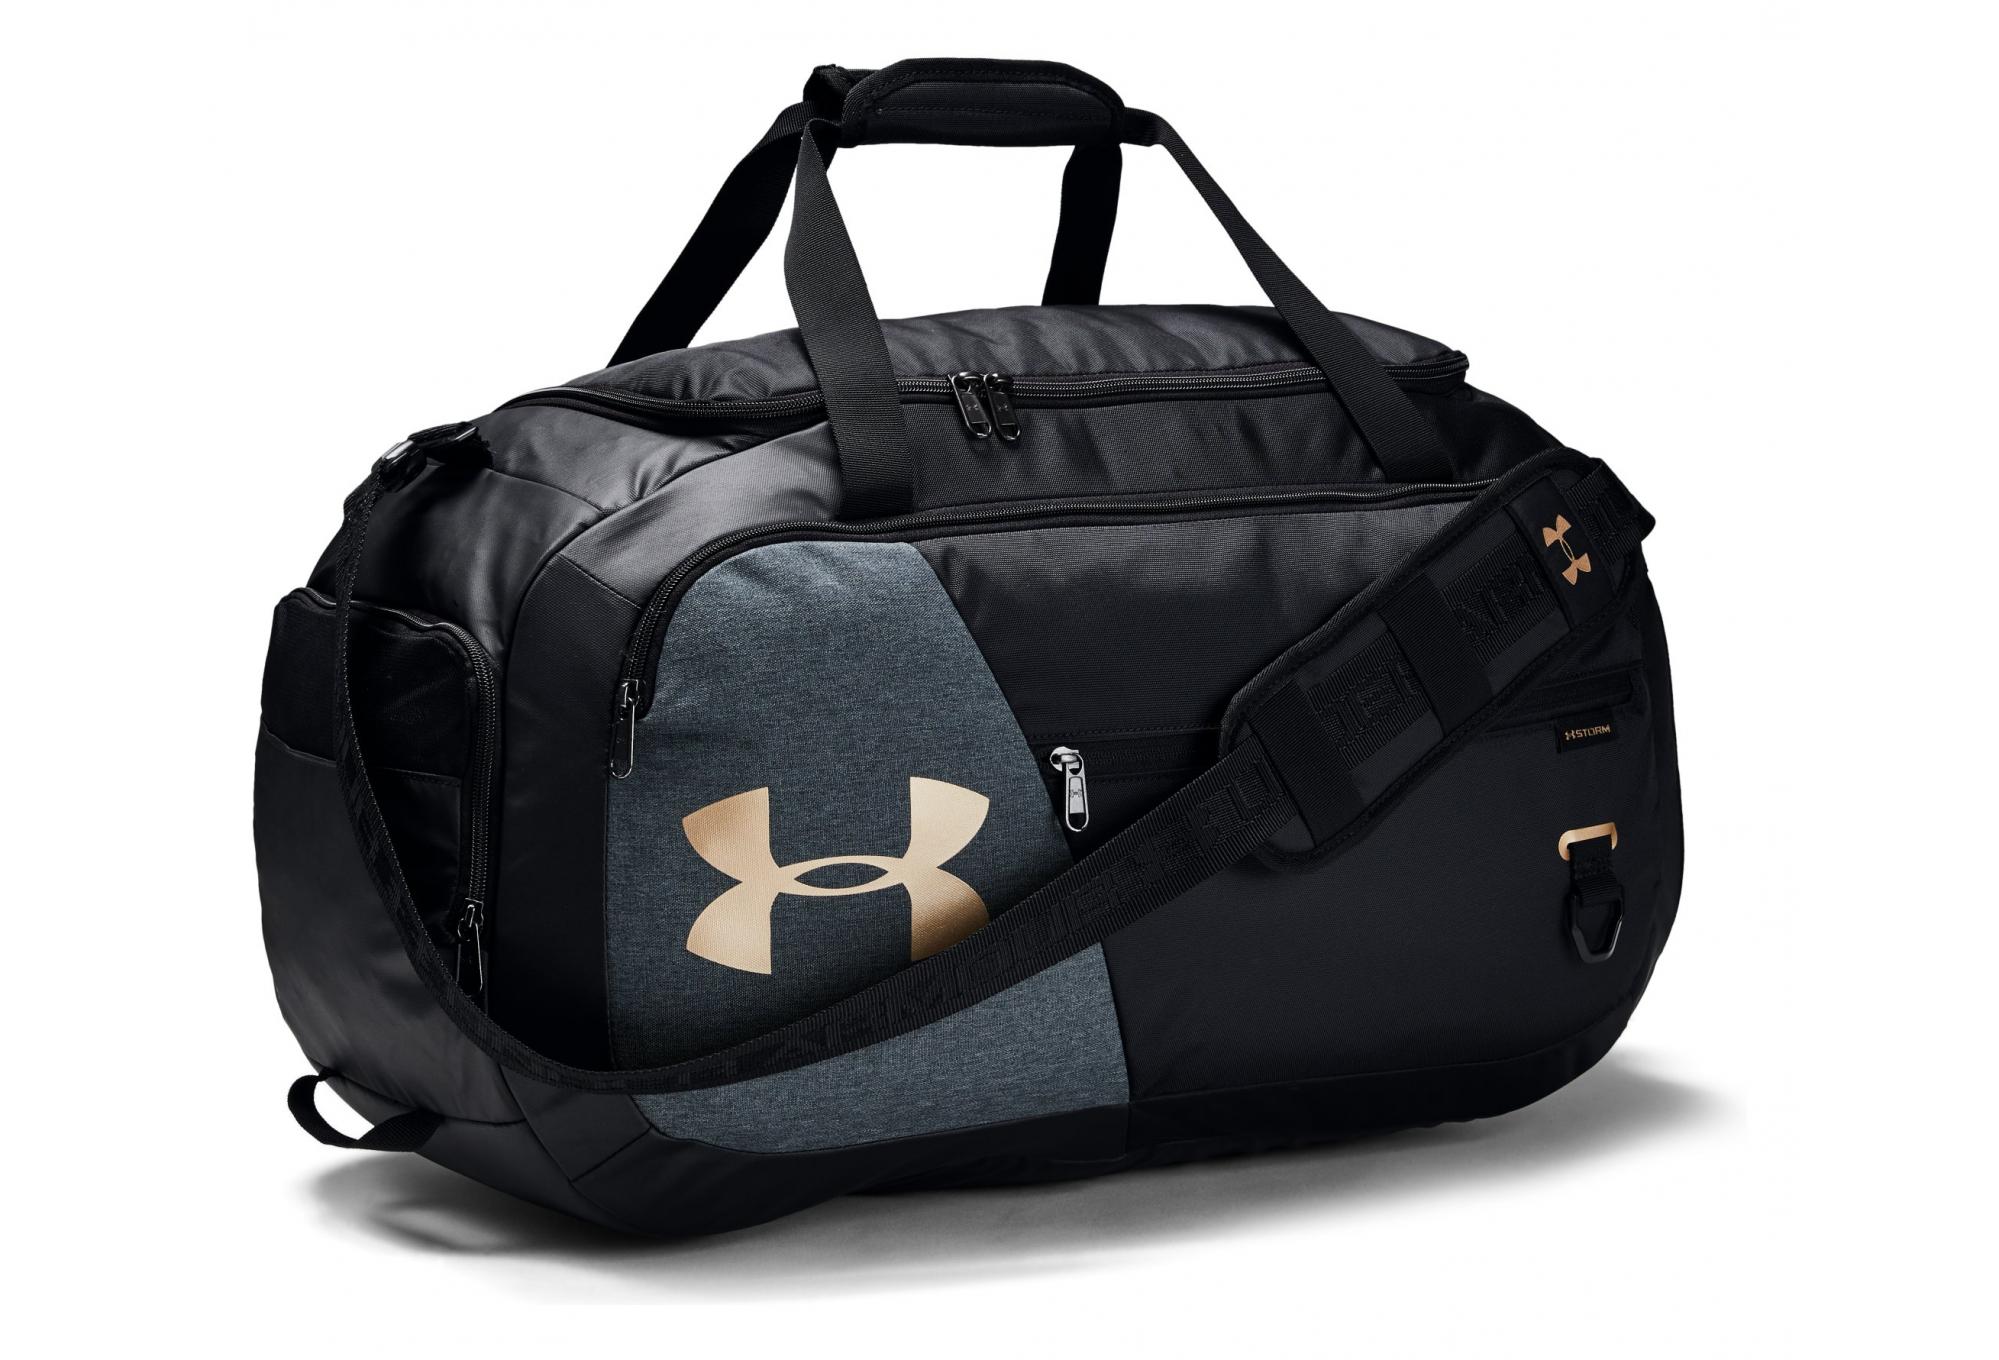 Medium Duffle Bag Black Gold